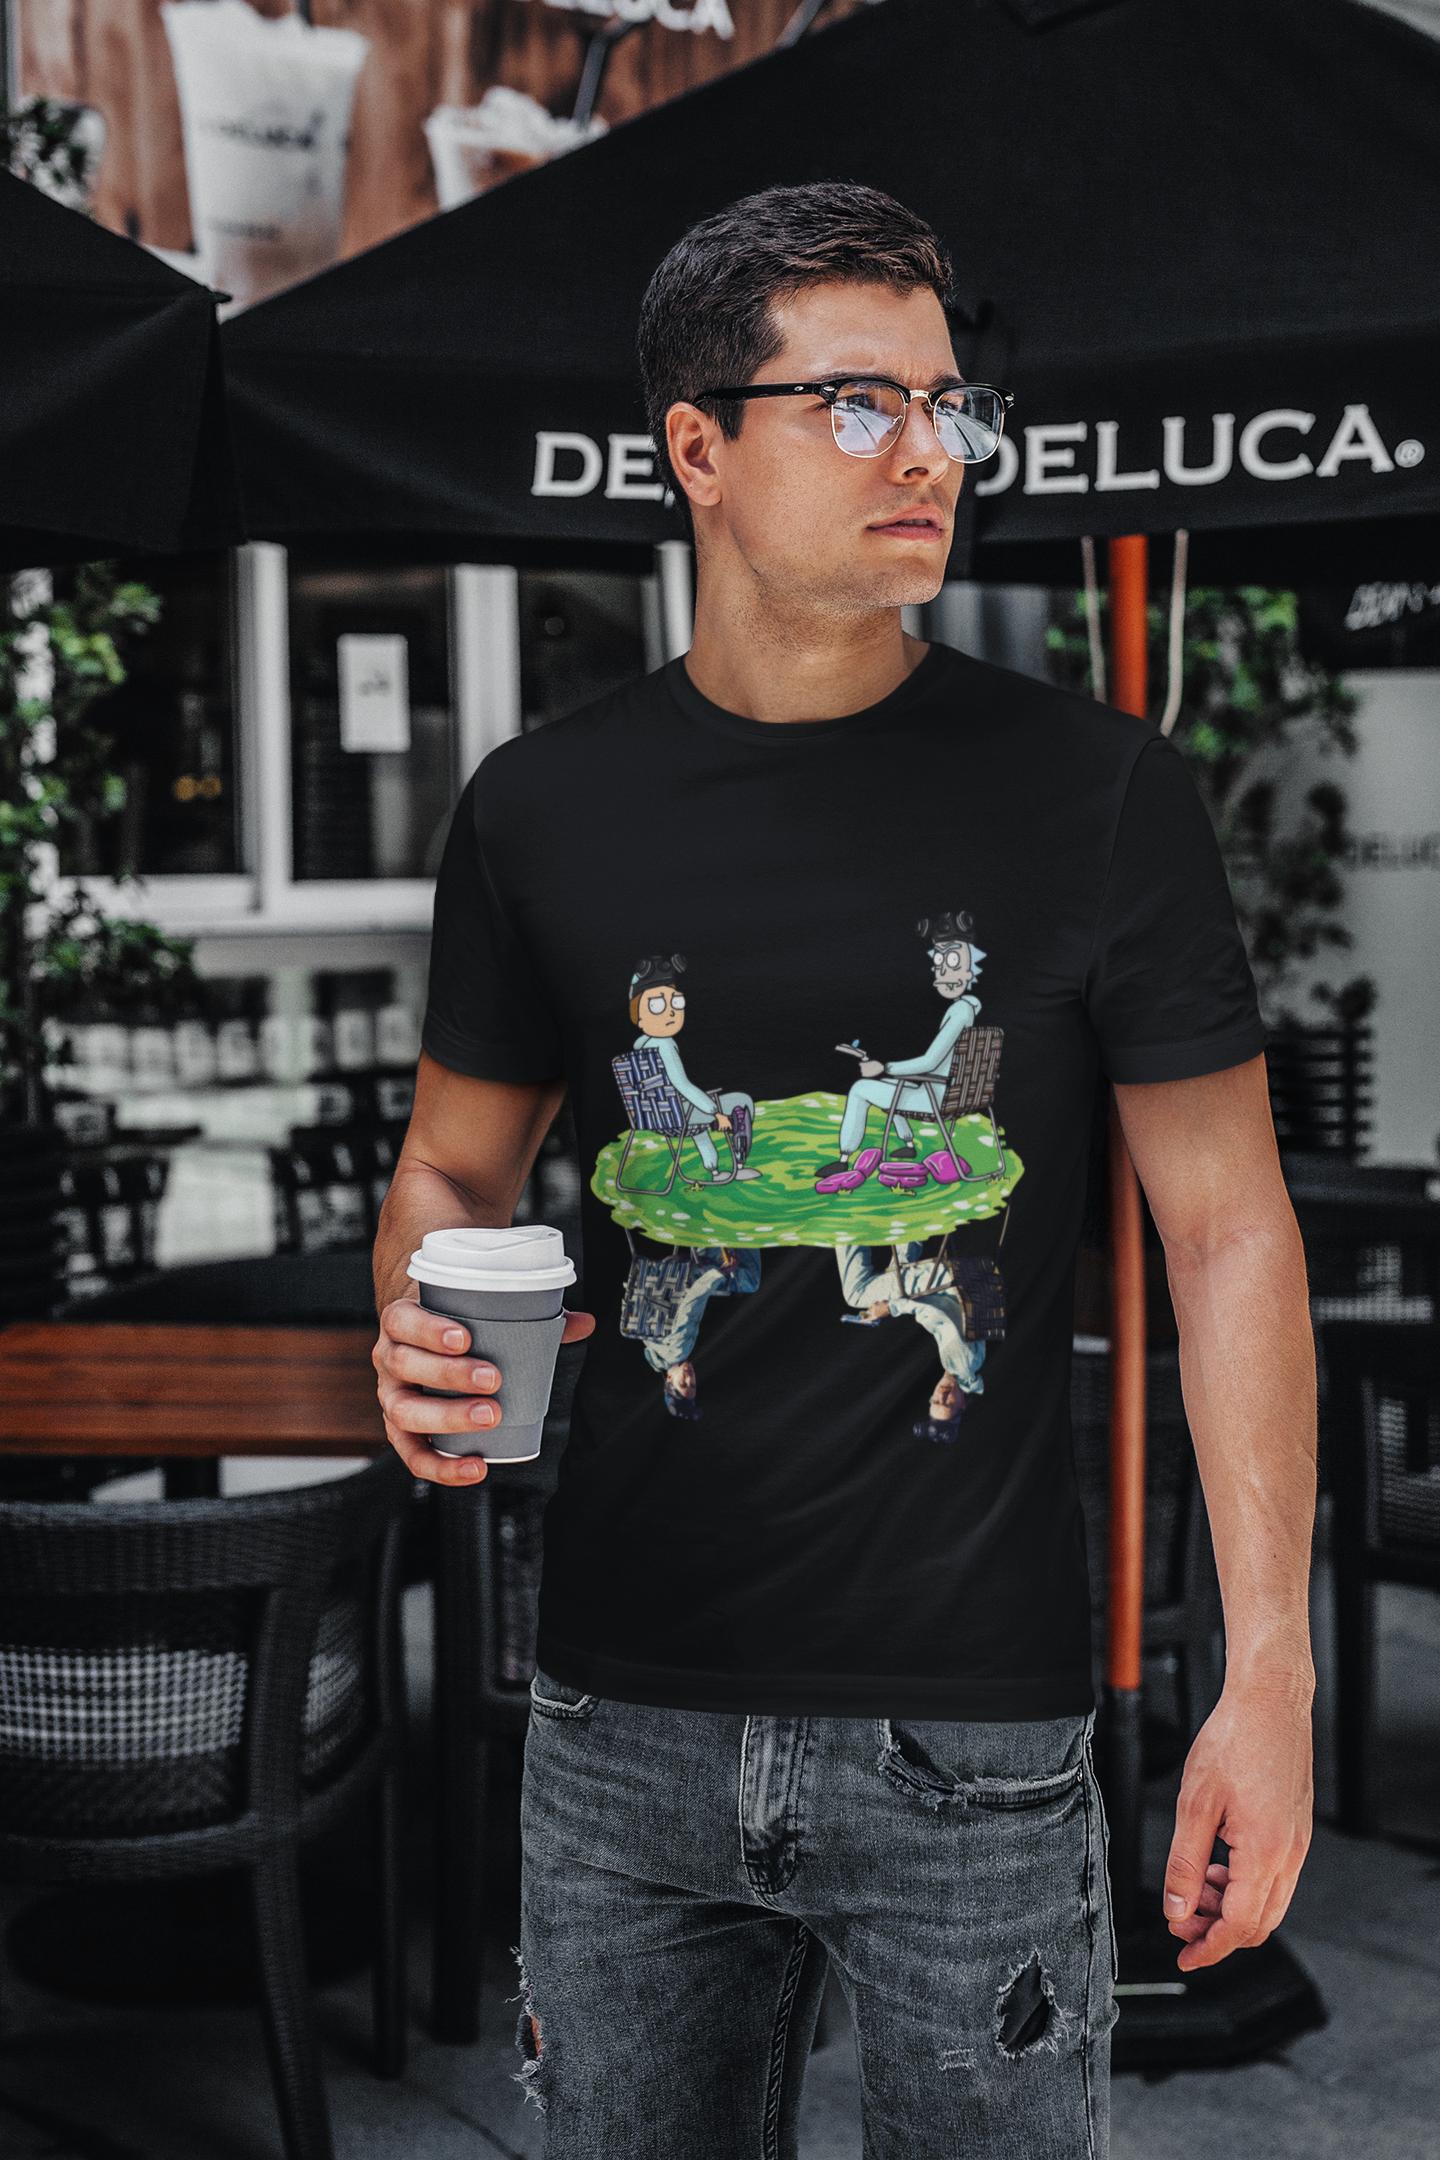 Rick and Morty water reflection Jesse Pinkman and Mr White shirt